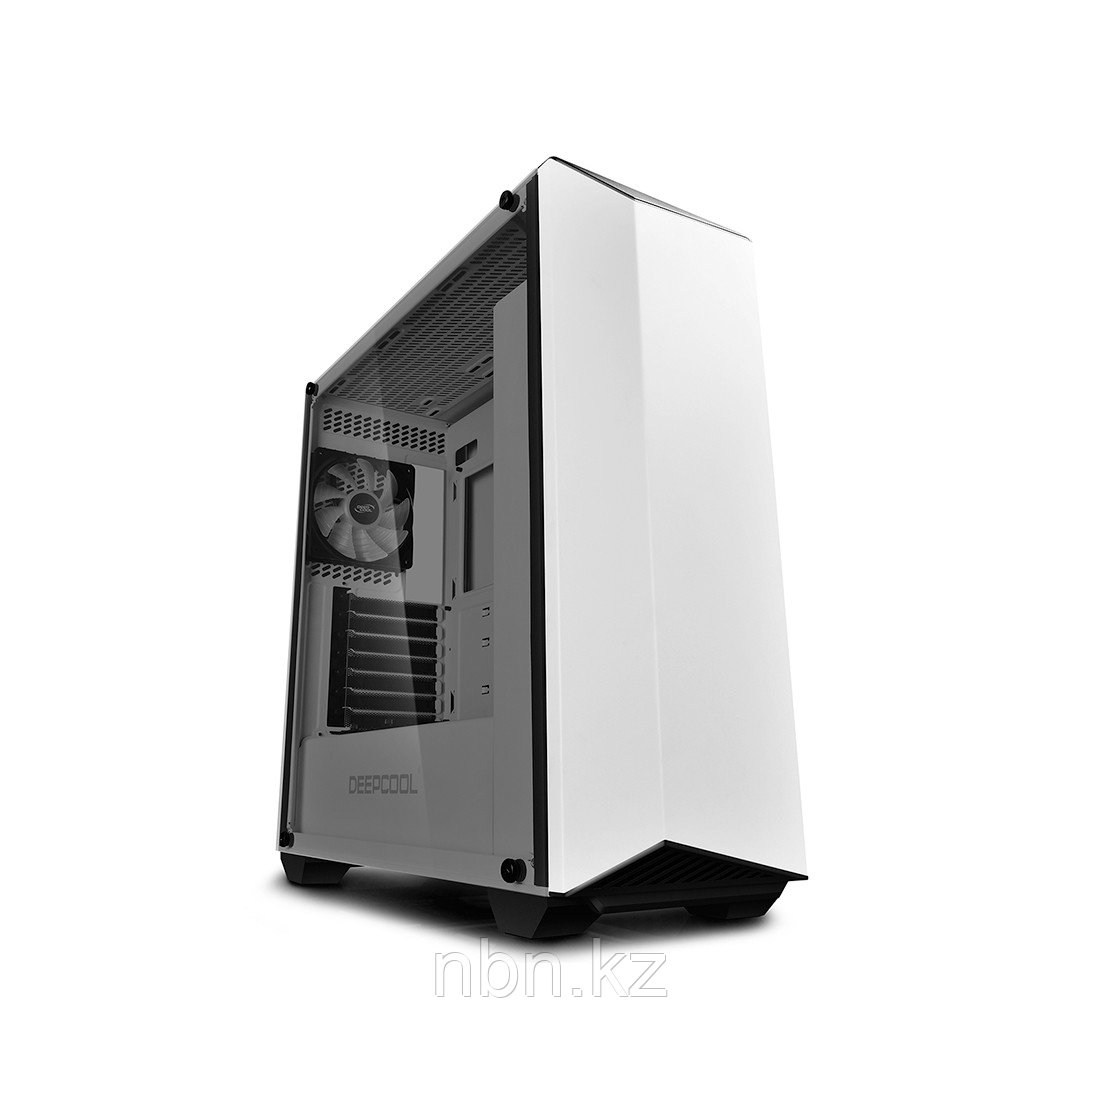 Компьютерный корпус Deepcool EARLKASE RGB WH без Б/П